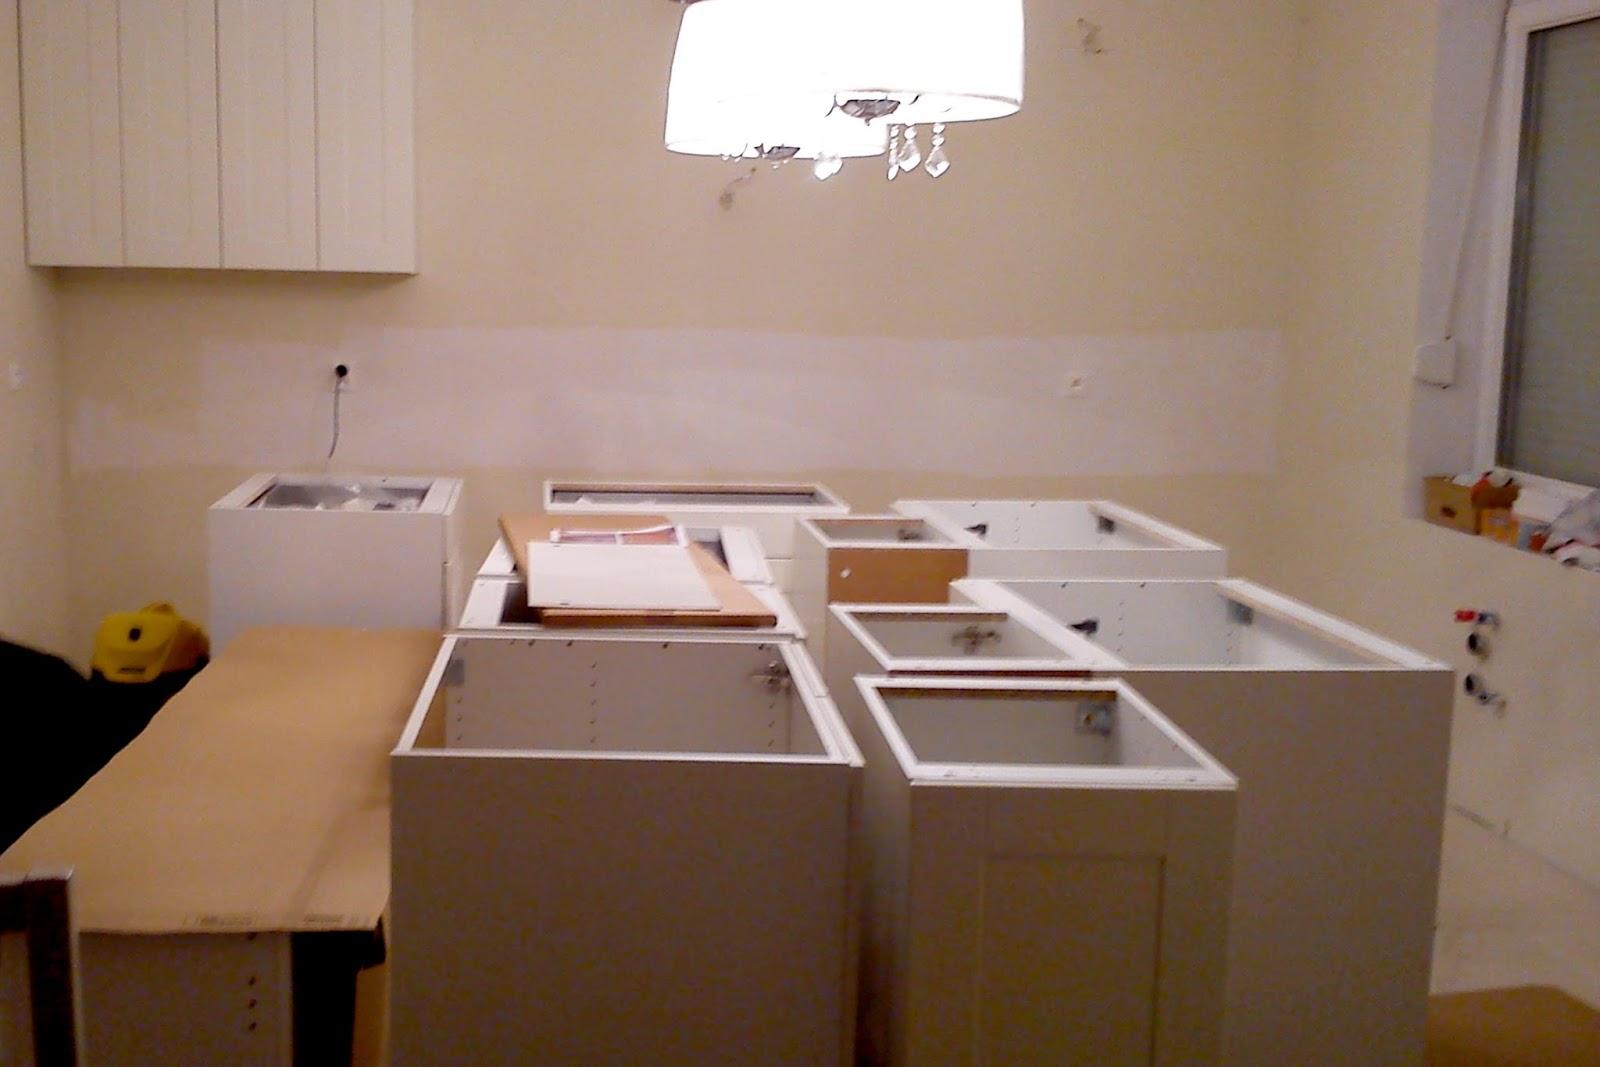 Home We Love Kuchnia Ikea Składamy Meble I Montujemy